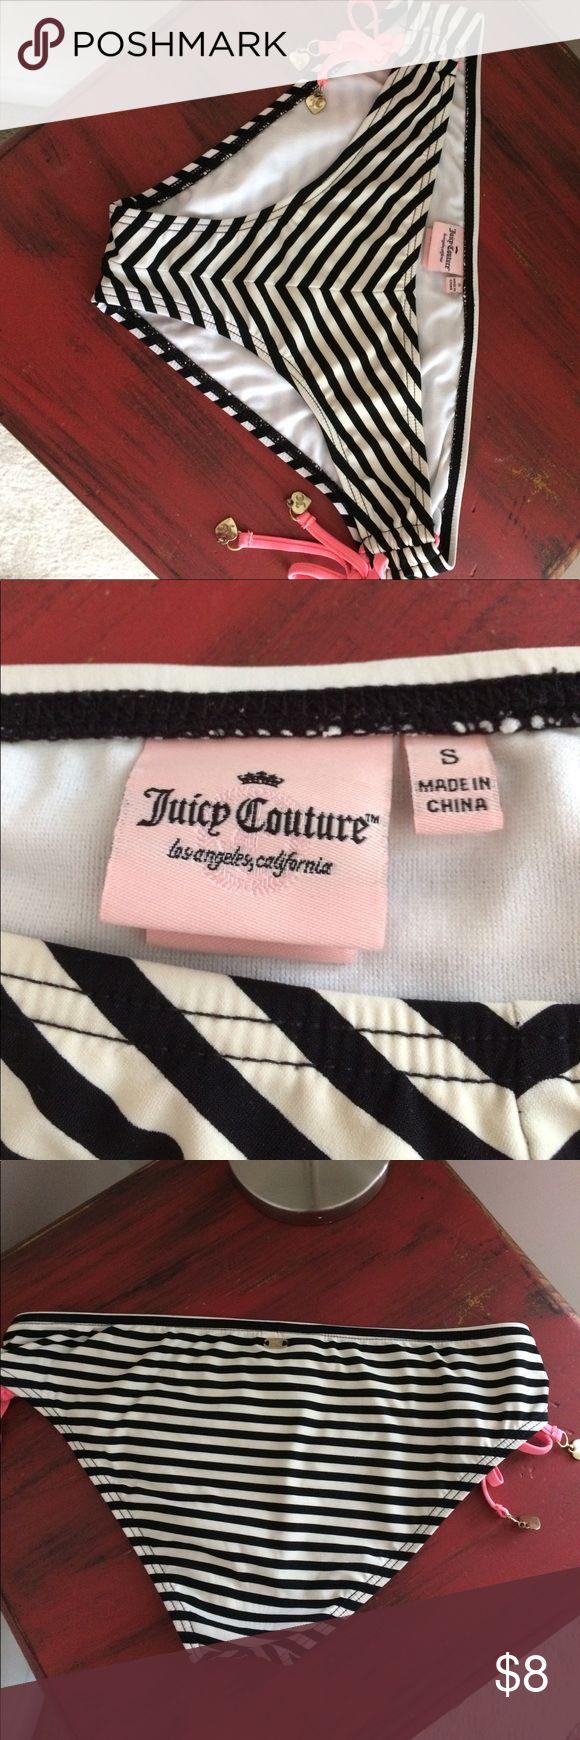 Juicy Couture bikini bottoms Cute black and cream striped bikini bottoms - looks great with a black top Juicy Couture Swim Bikinis